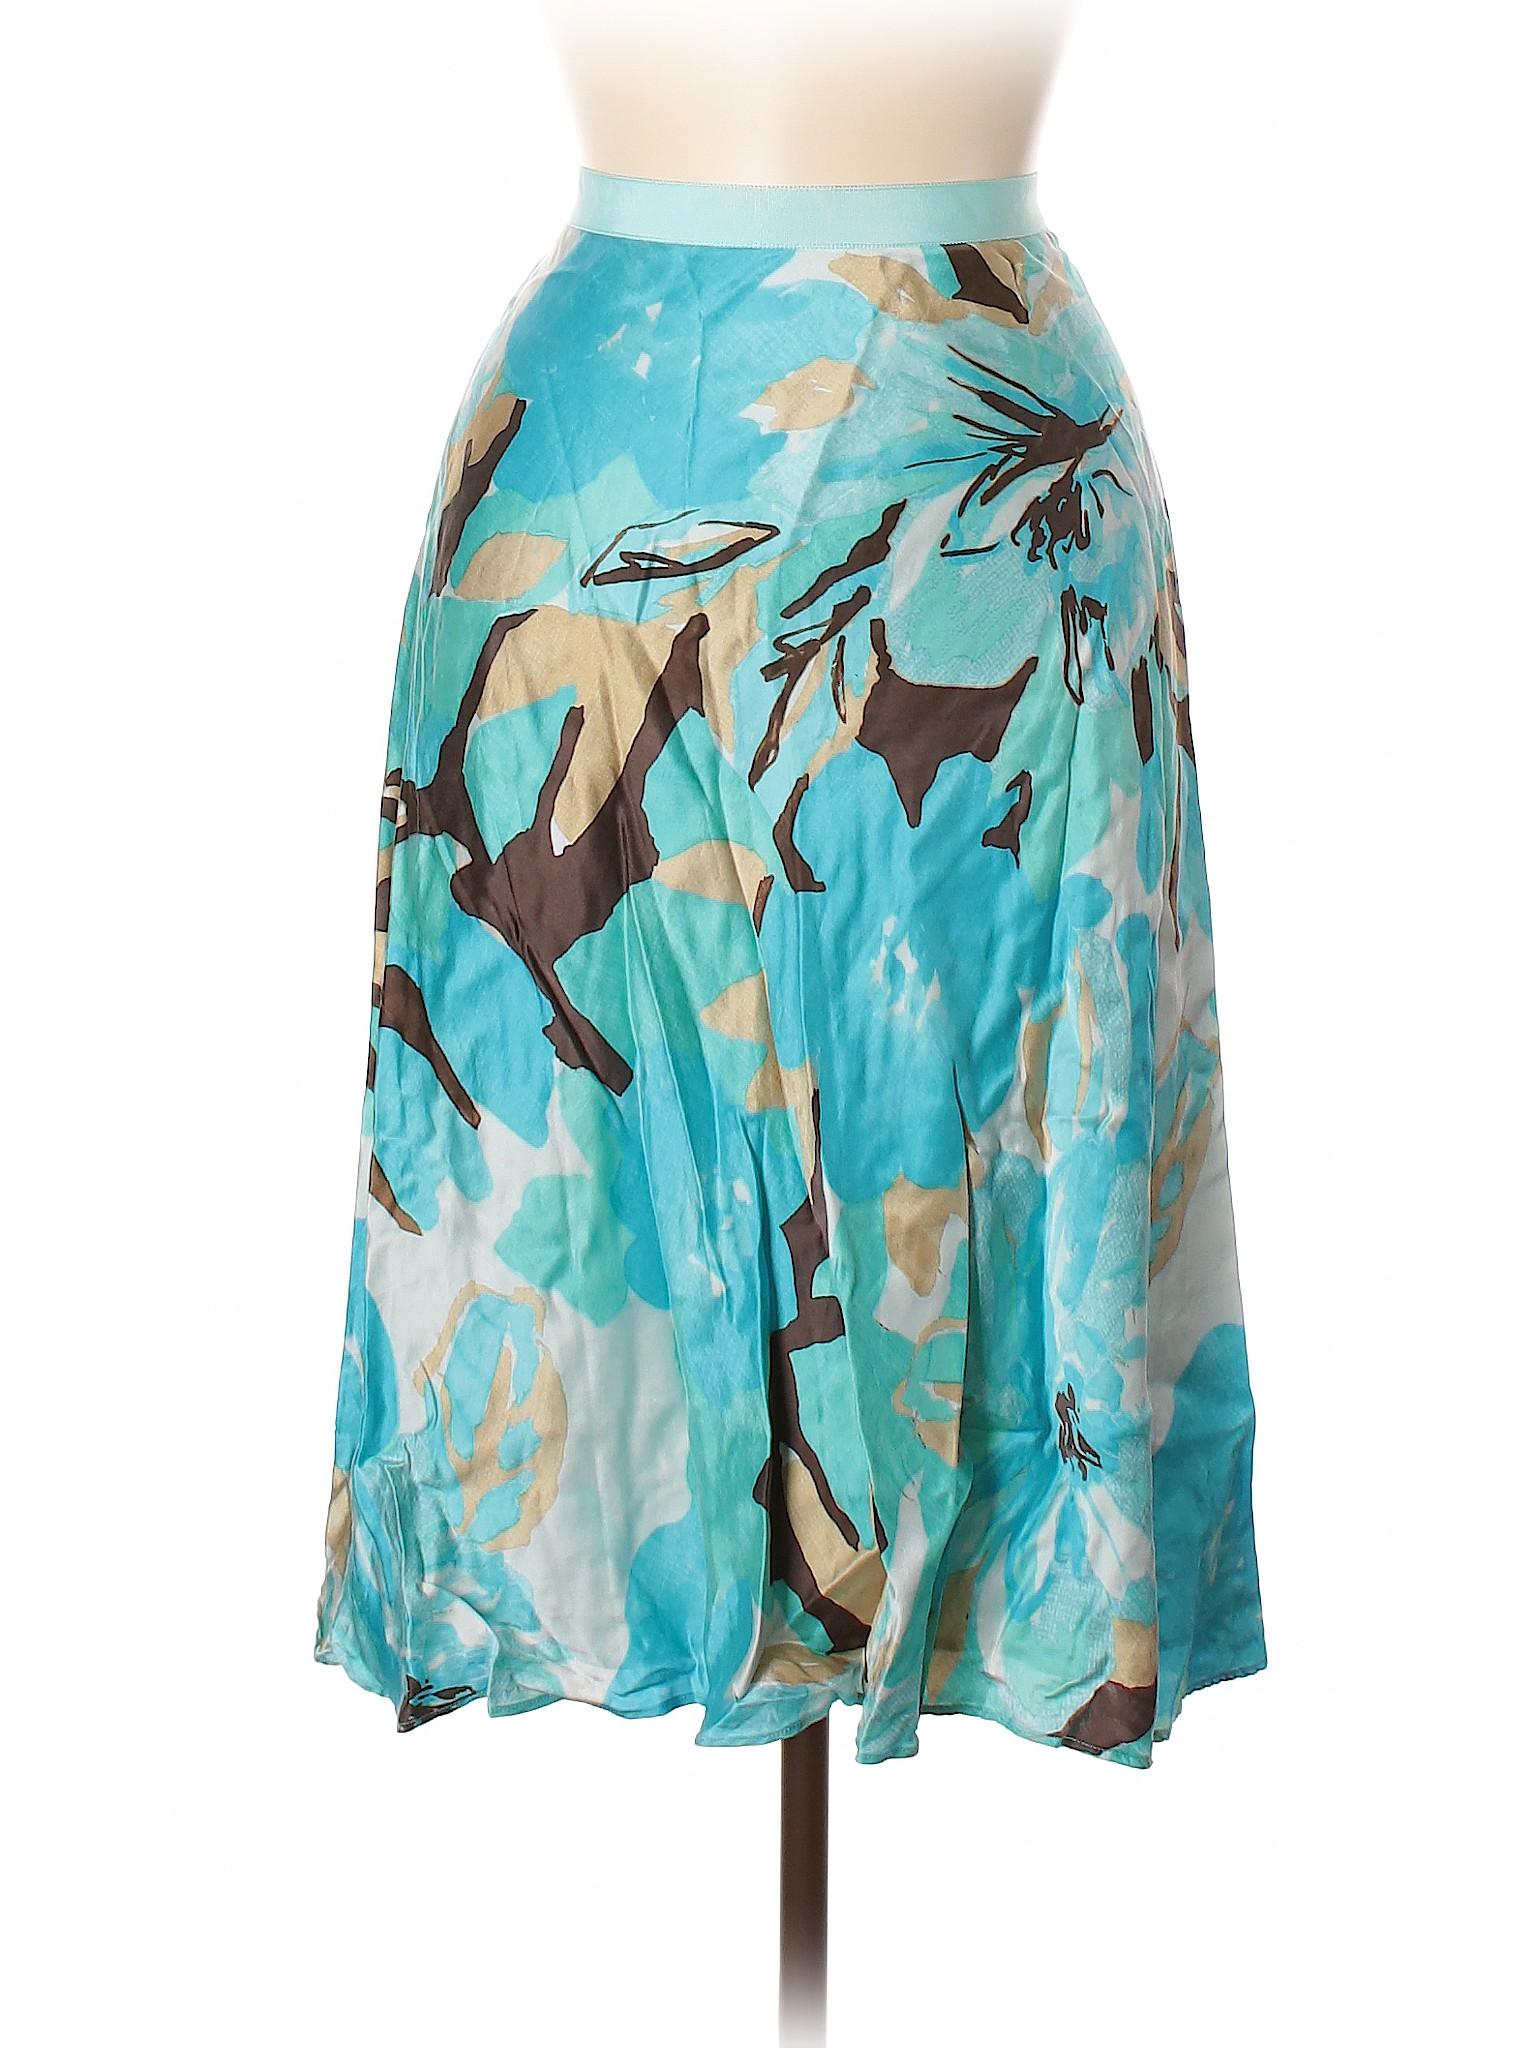 Silk Boutique Boutique Skirt Boutique Skirt Silk pIqPwdxax